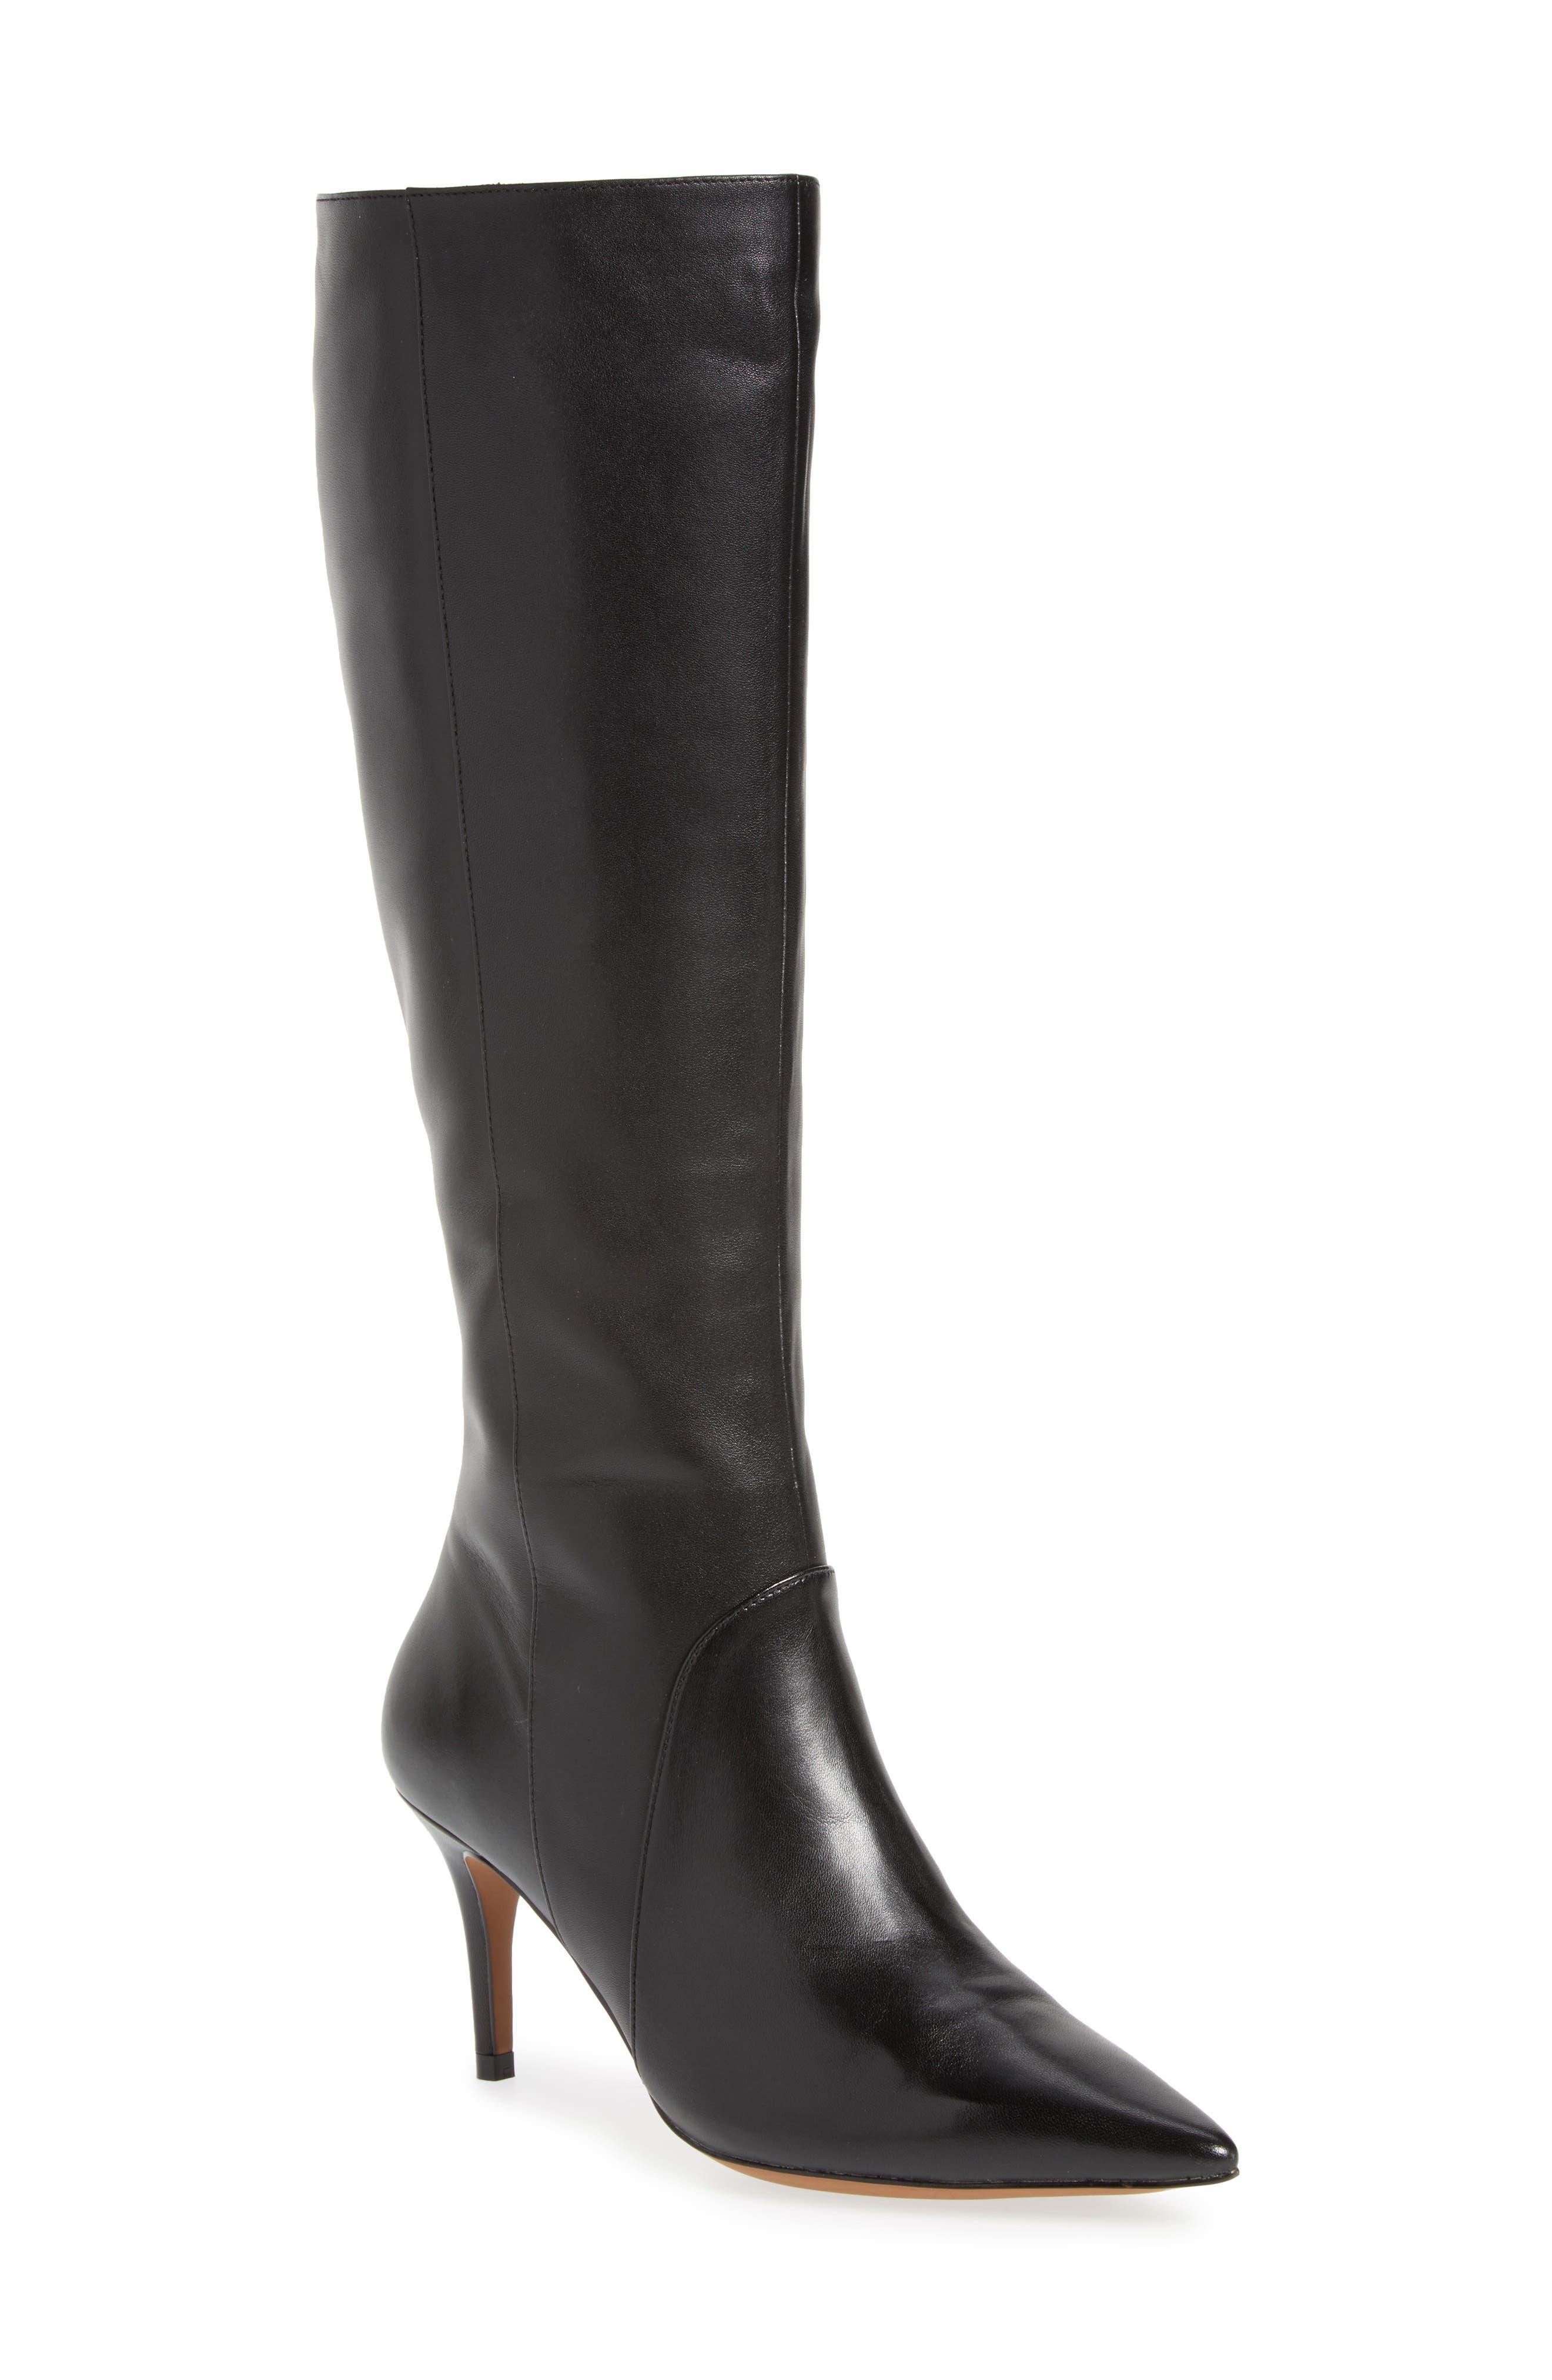 Linea Paolo Perfect Boot- Black